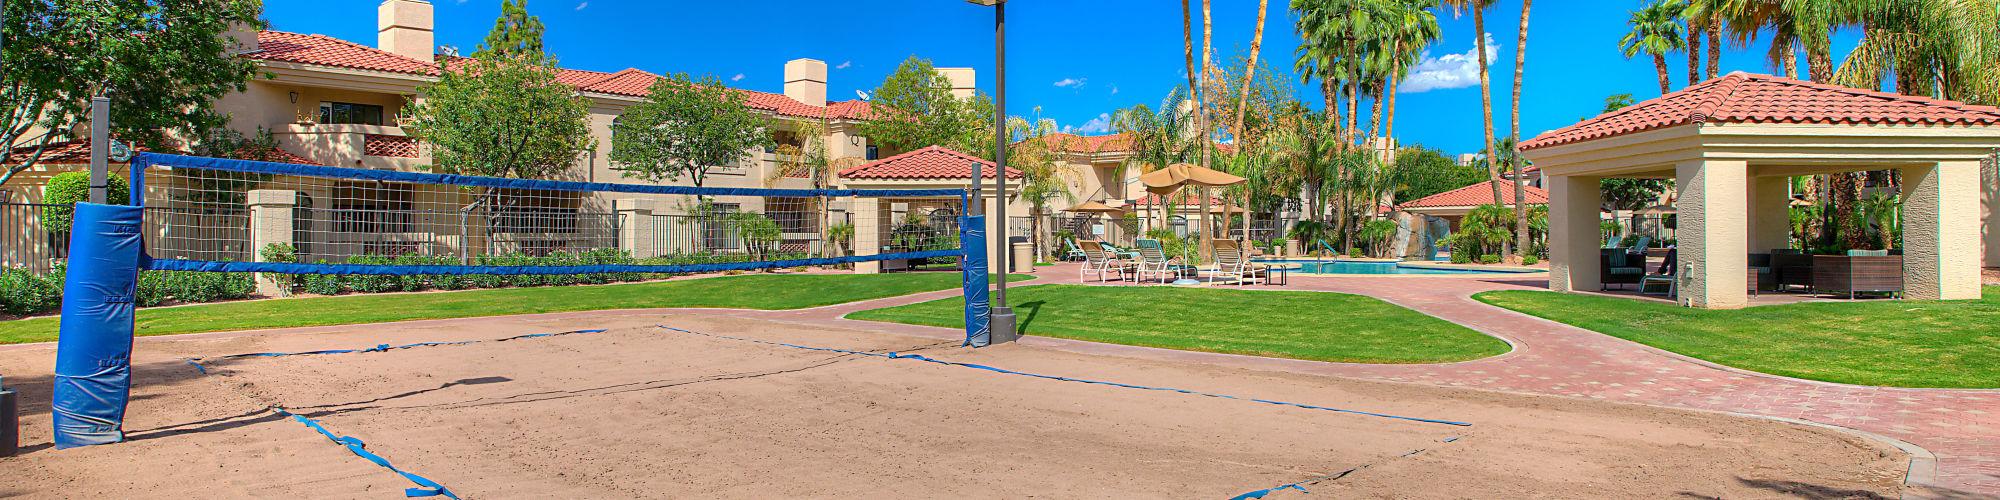 Photos of San Palmilla in Tempe, Arizona